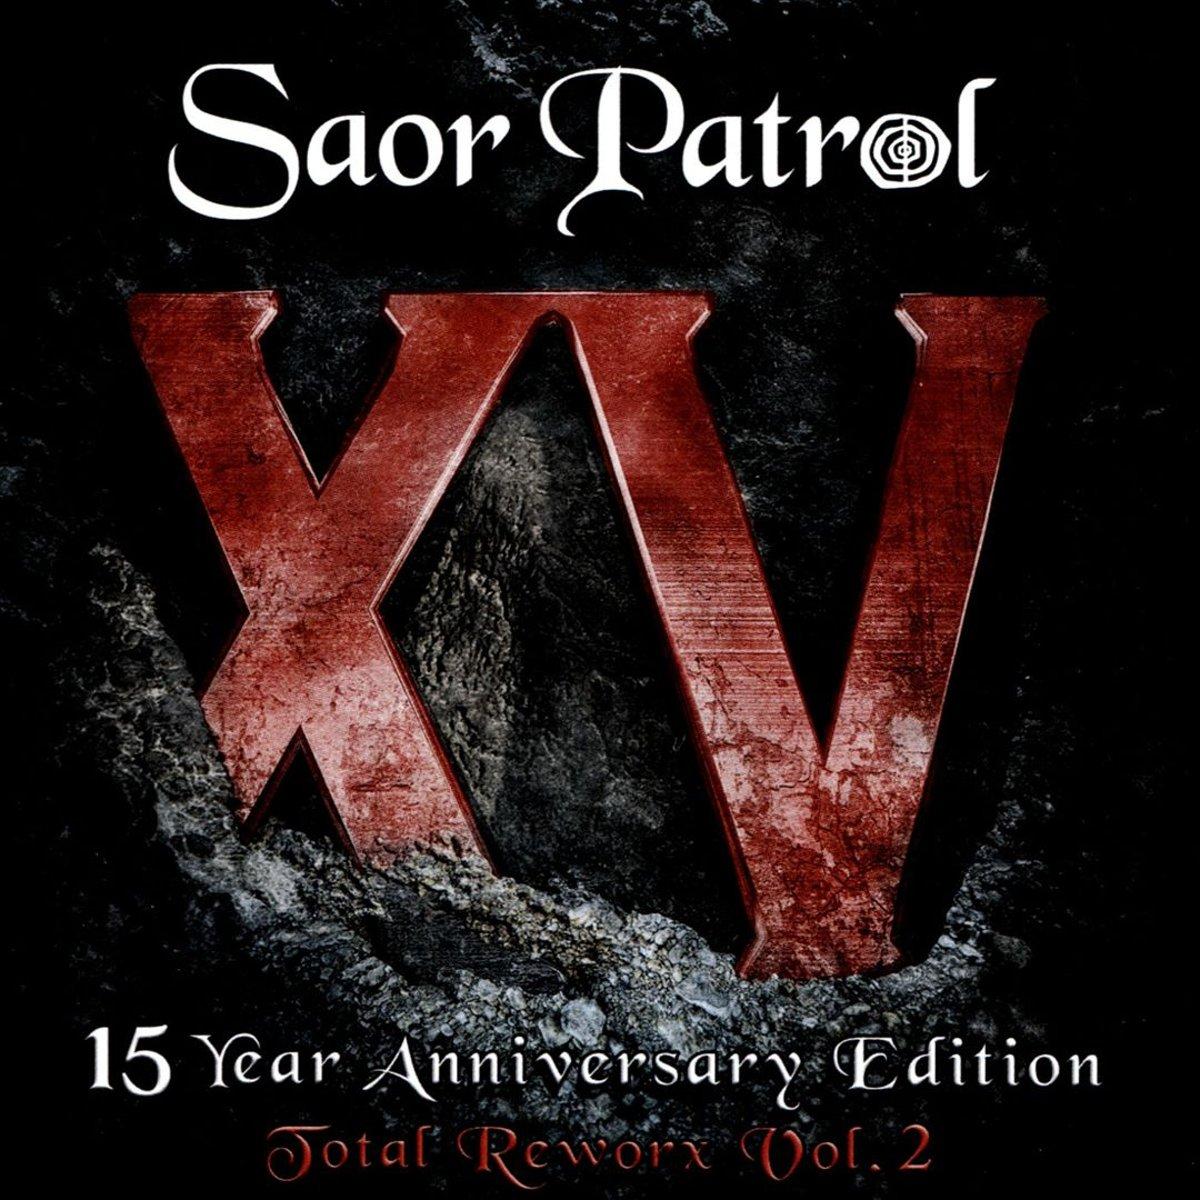 Xv. 15 Year Anniversary Ed. Total Reworx Vol. 2 kopen